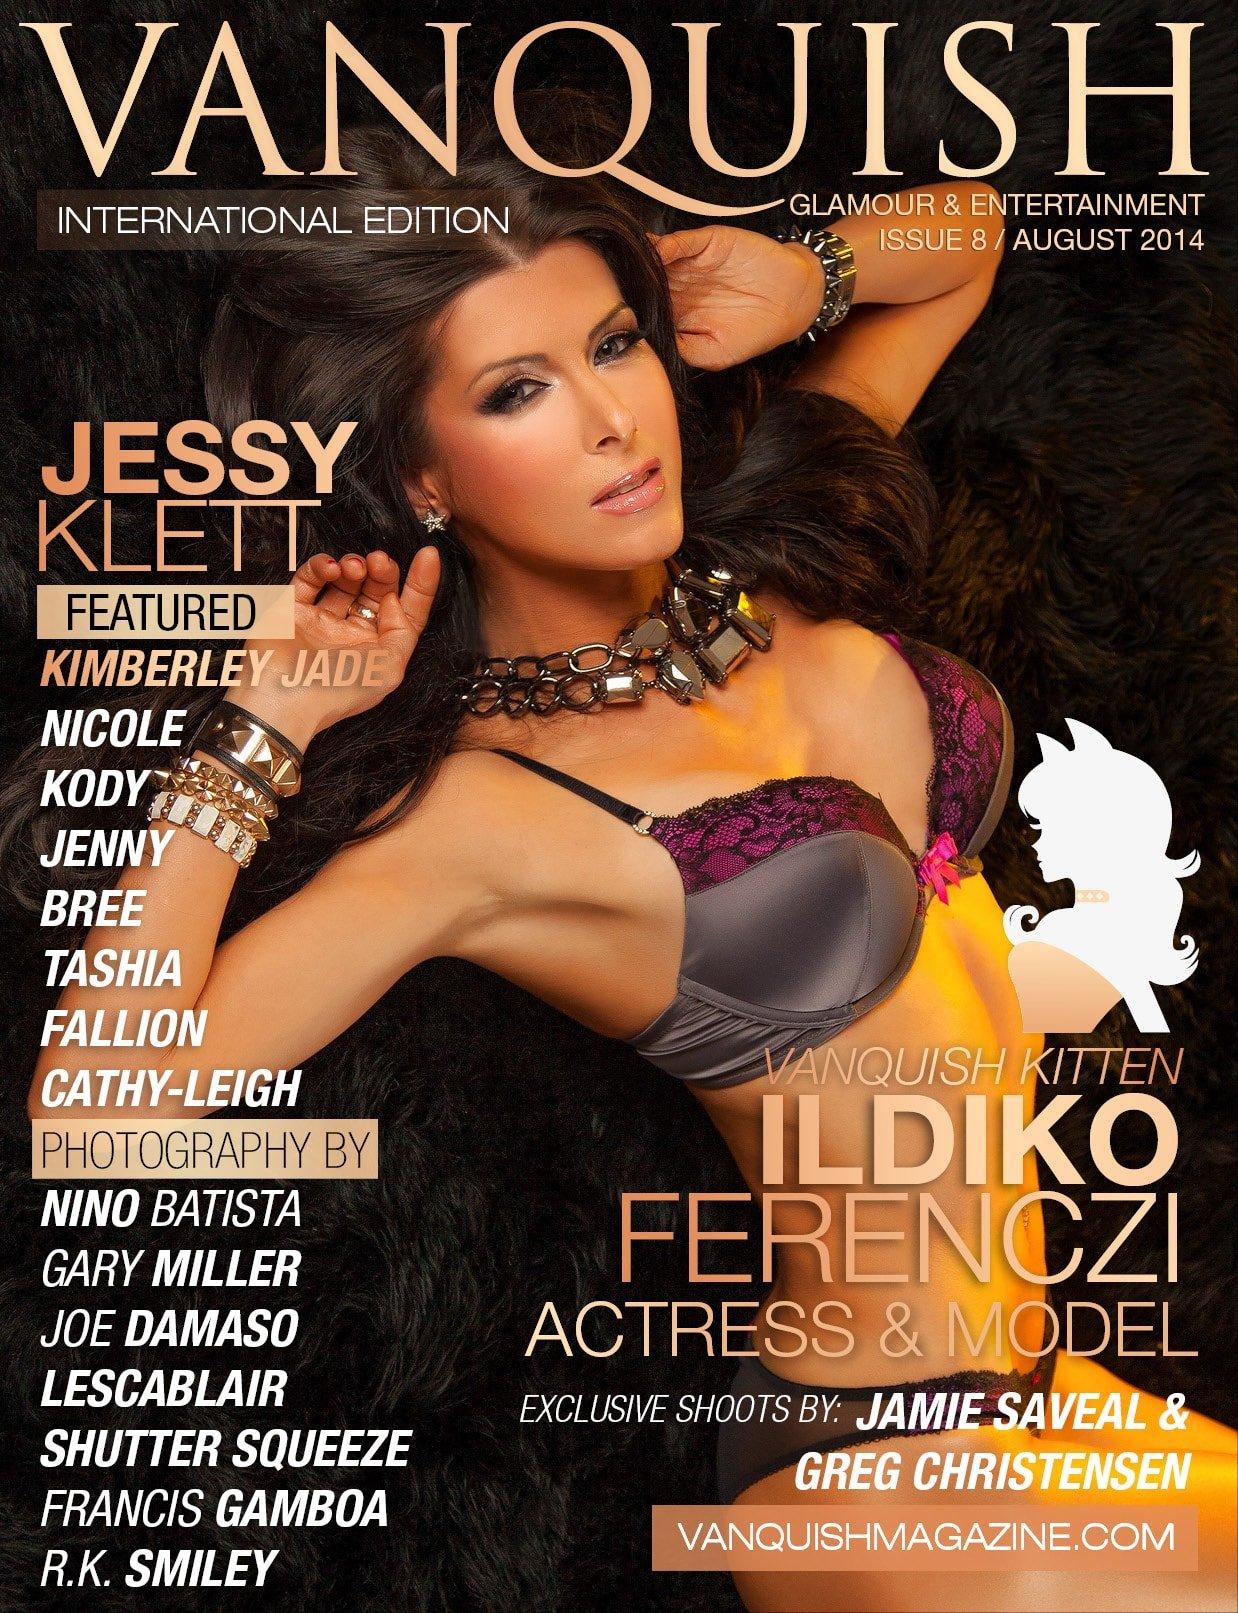 Vanquish Magazine - August 2014 - Ildiko Ferenczi 1